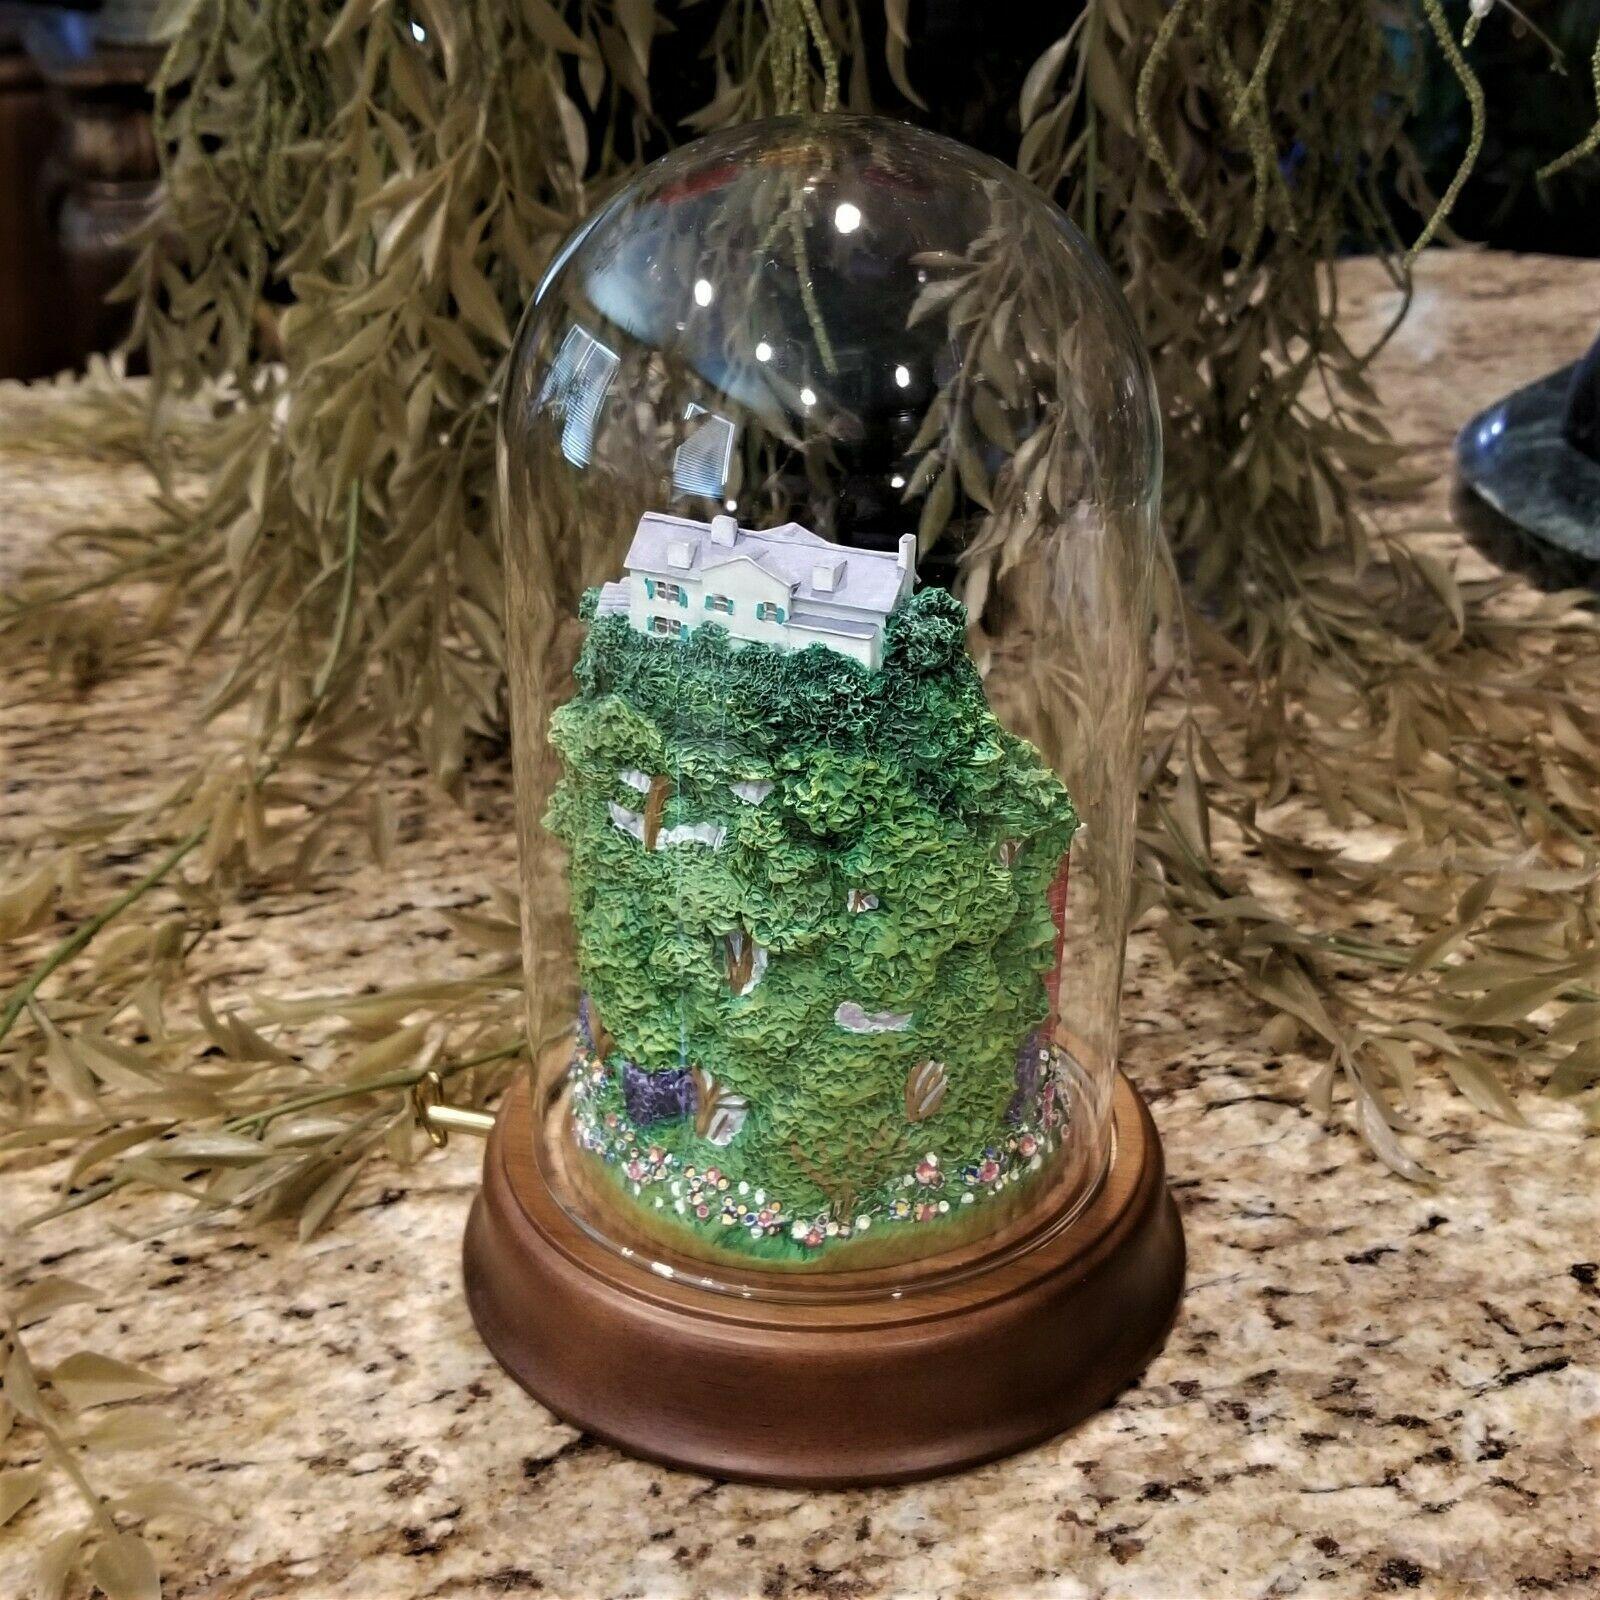 Franklin Mint Elvis Presley Graceland Love Me Tender Music Box Glass Dome Figure image 3